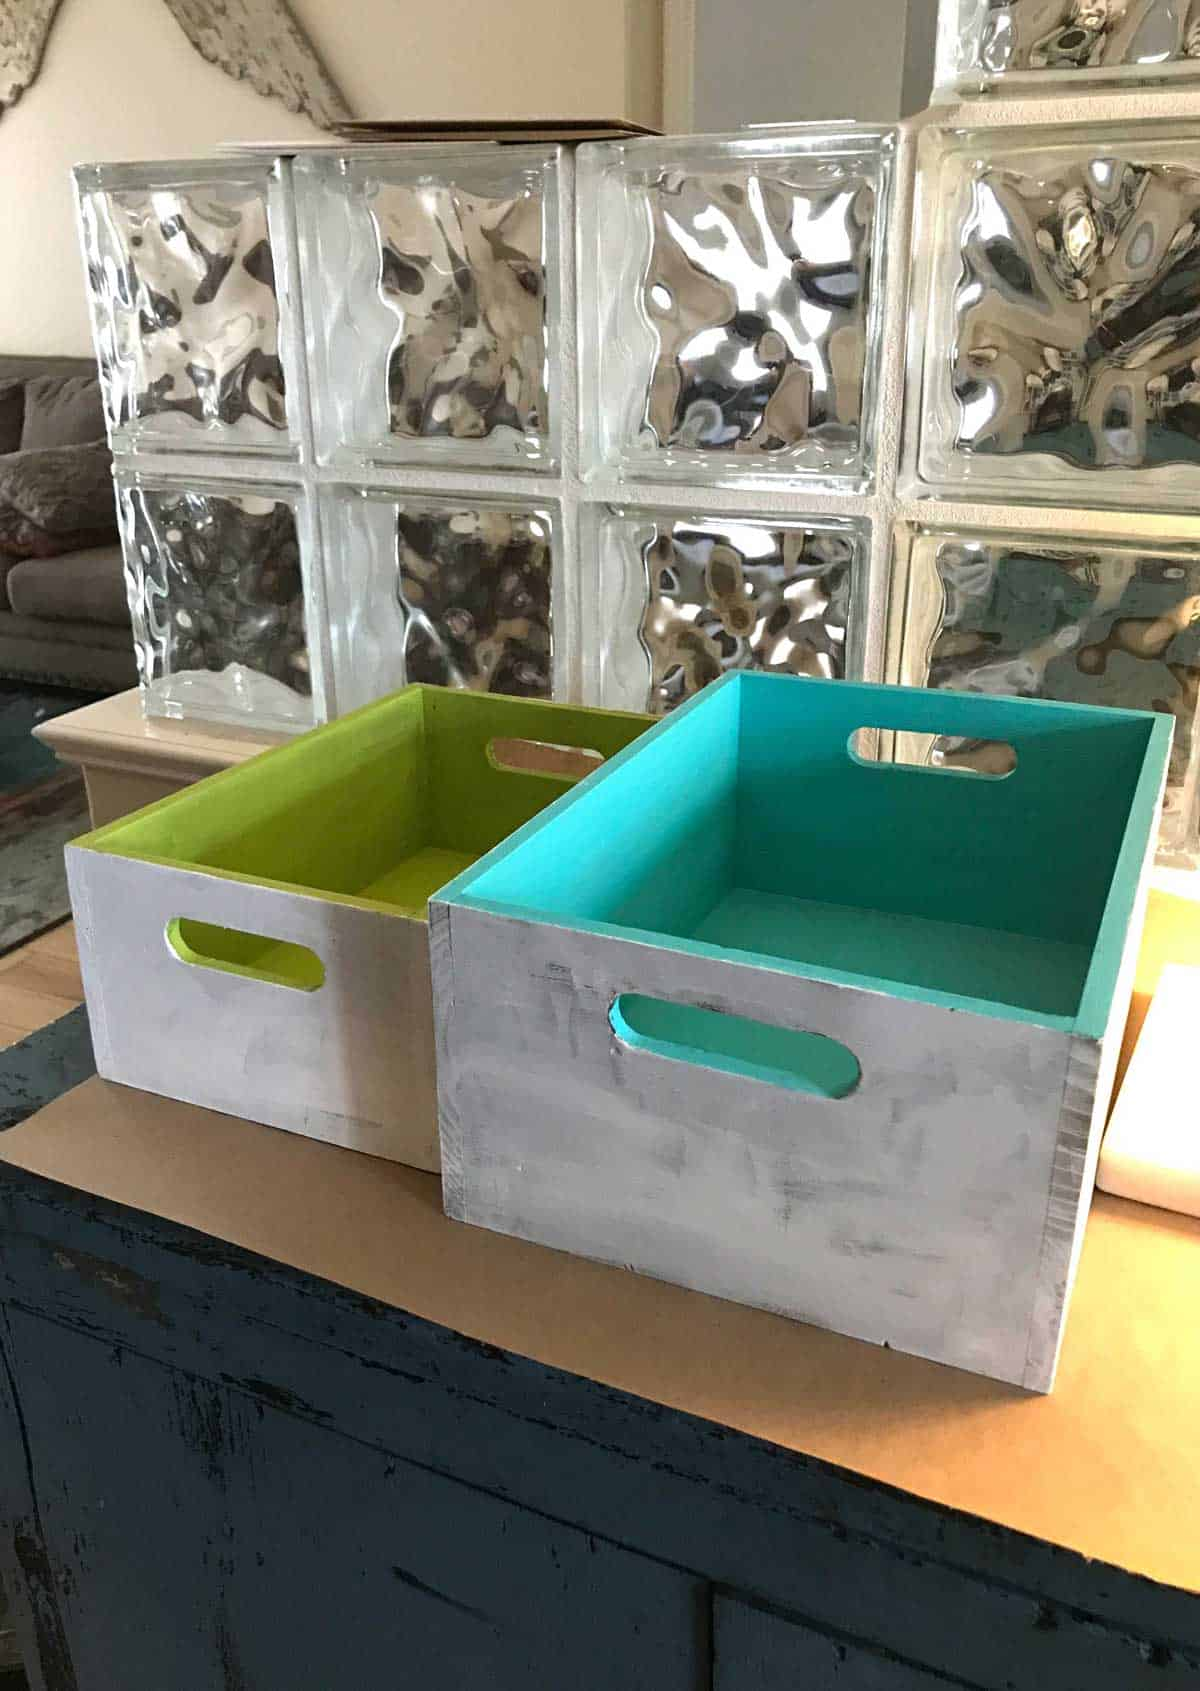 DIY Storage Ideas For Organizing - Decoupage Boxes | Artsy Fartsy Life